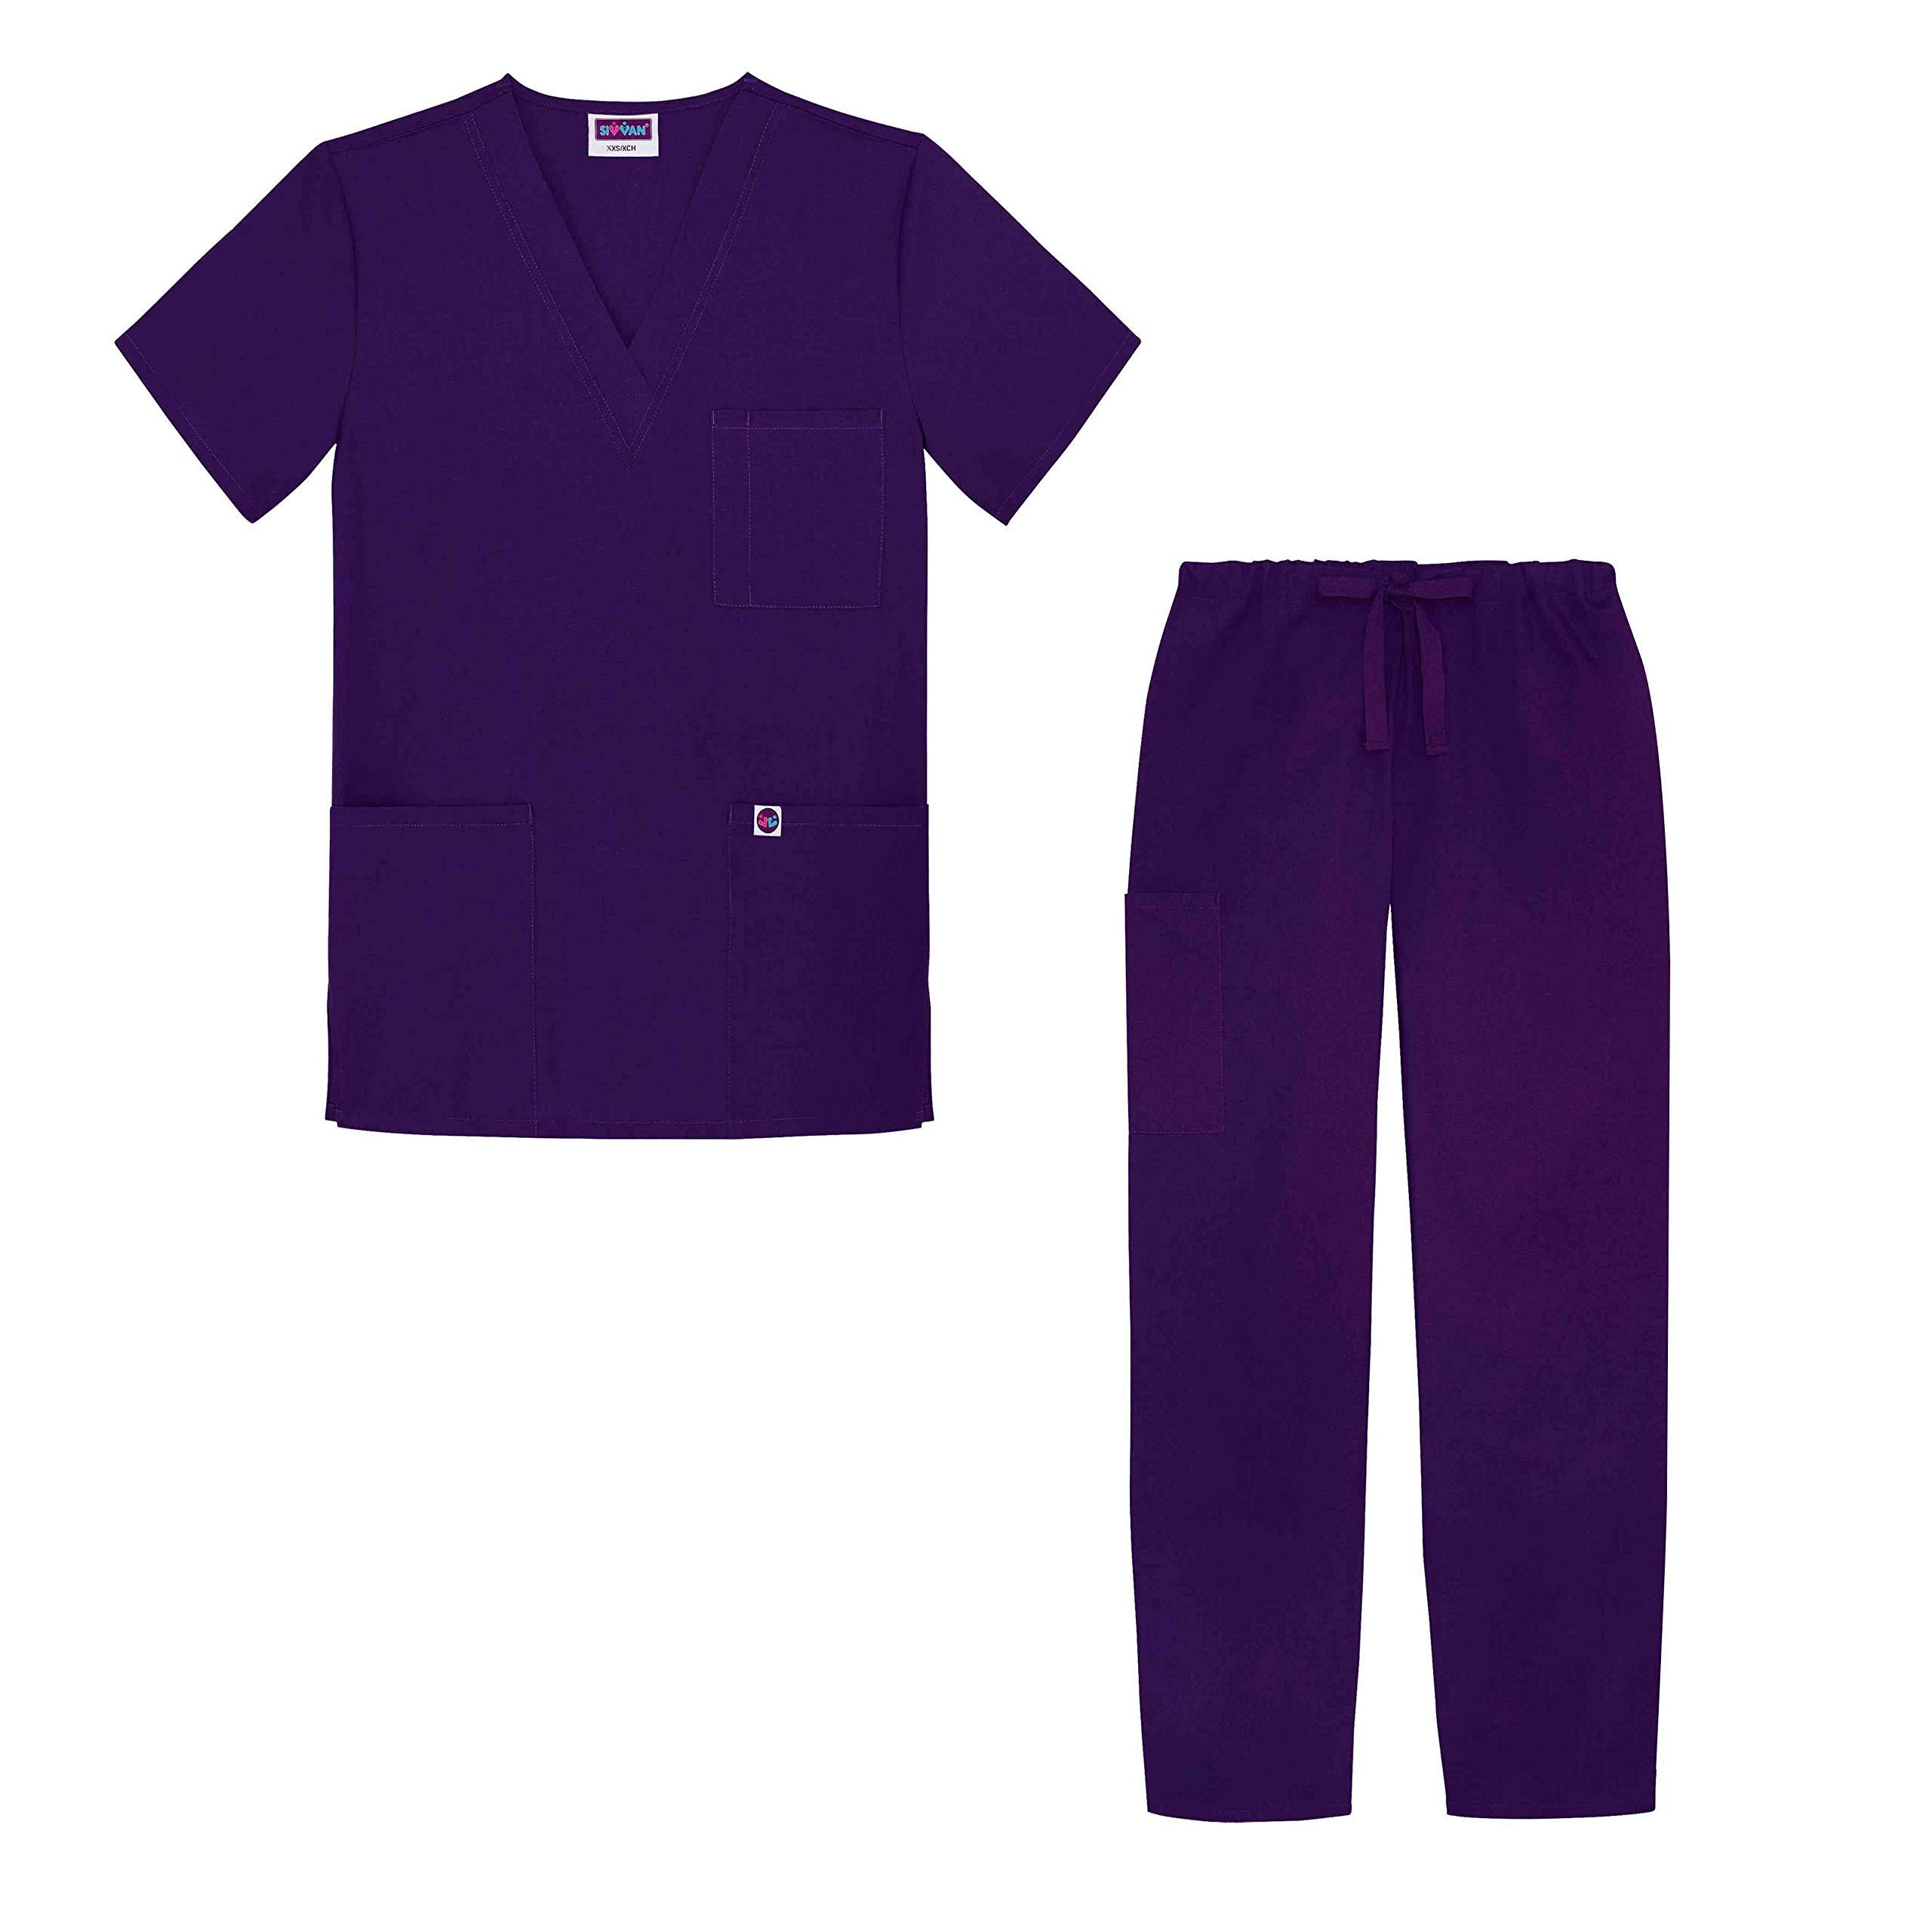 Sivvan Unisex Classic Scrub Set V-neck Top/Drawstring Pants - S8400 - Purple - 2X